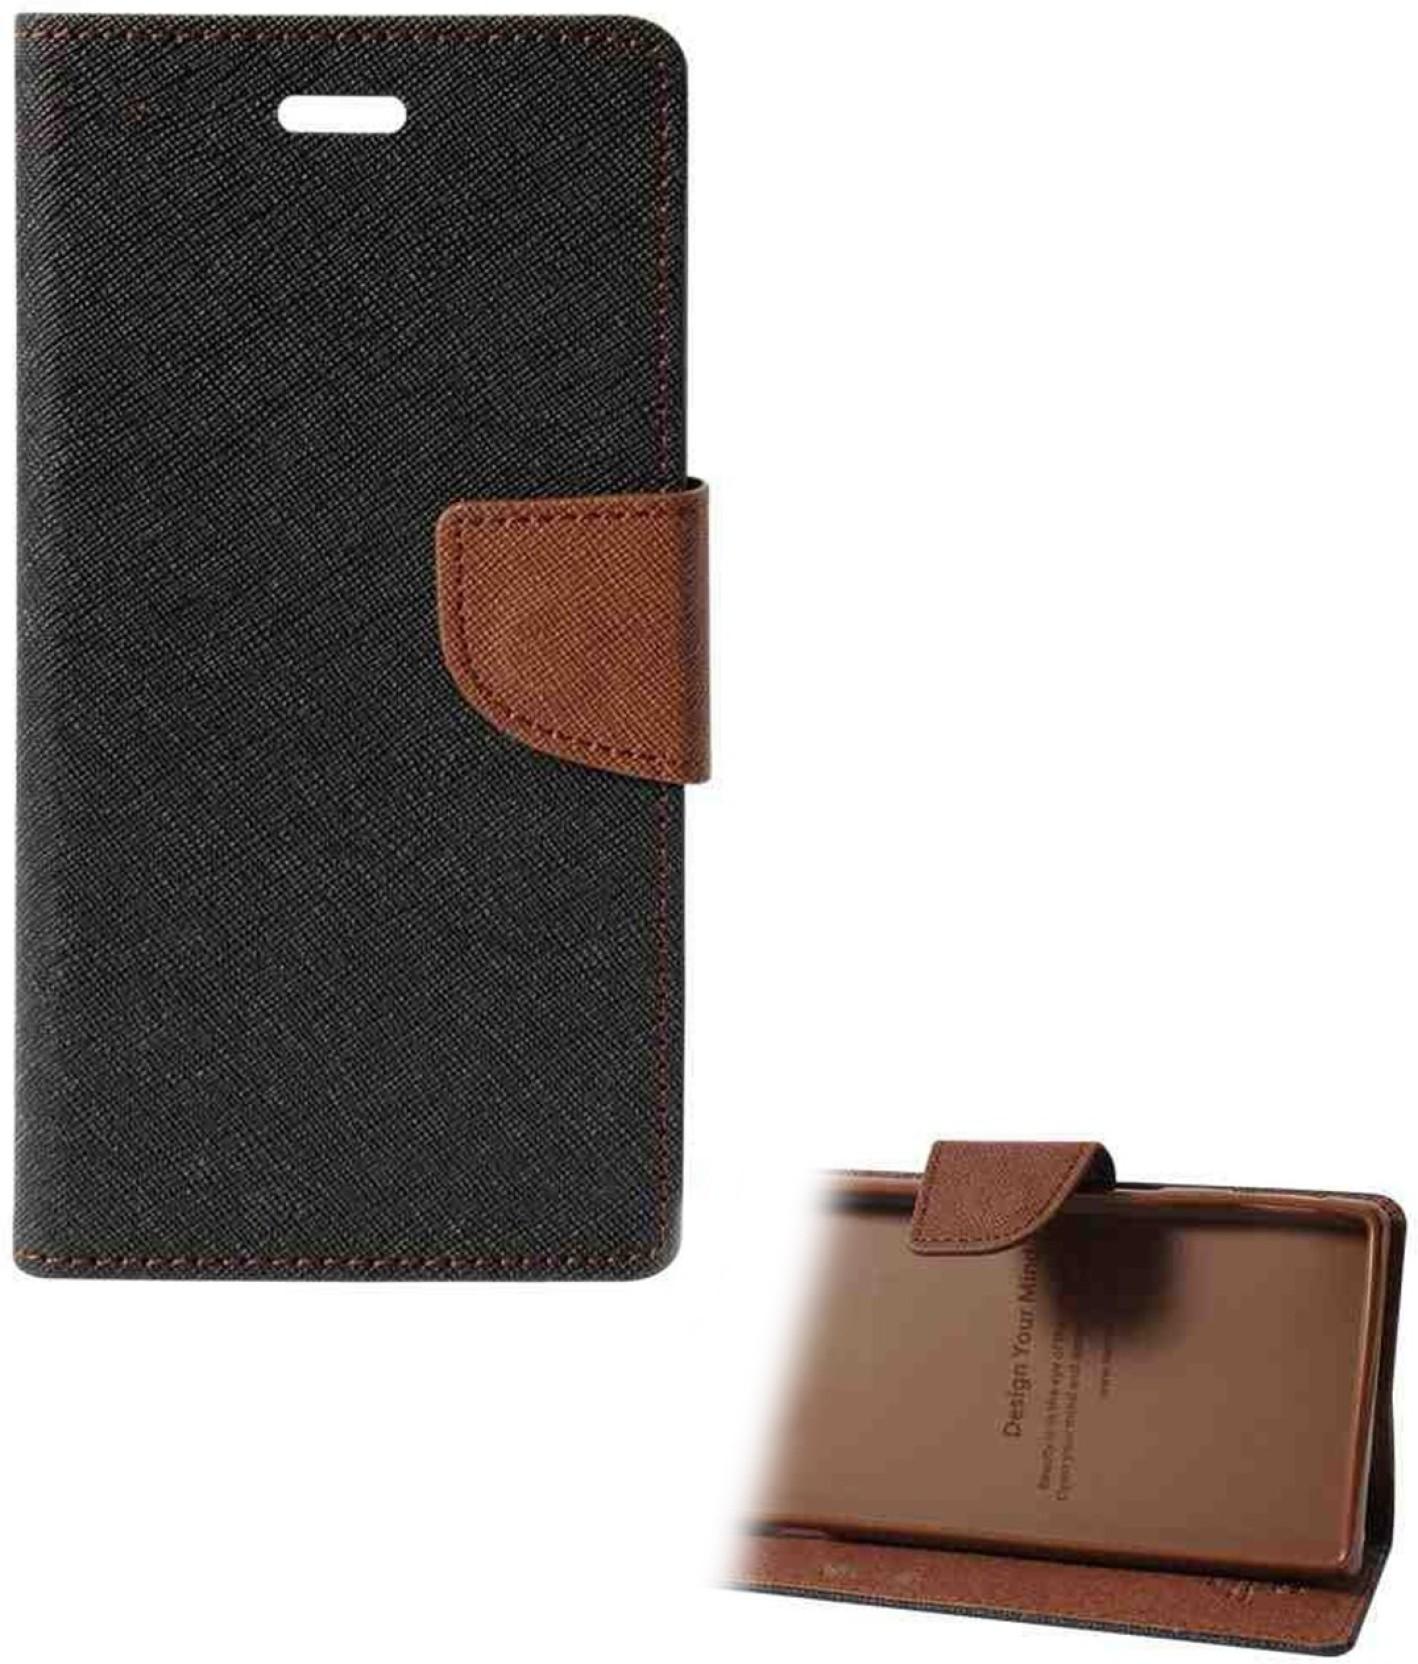 meet e08b4 78c1e Heinibeg Flip Cover for Samsung Galaxy Mega 5.8 (GT-I9152 ...